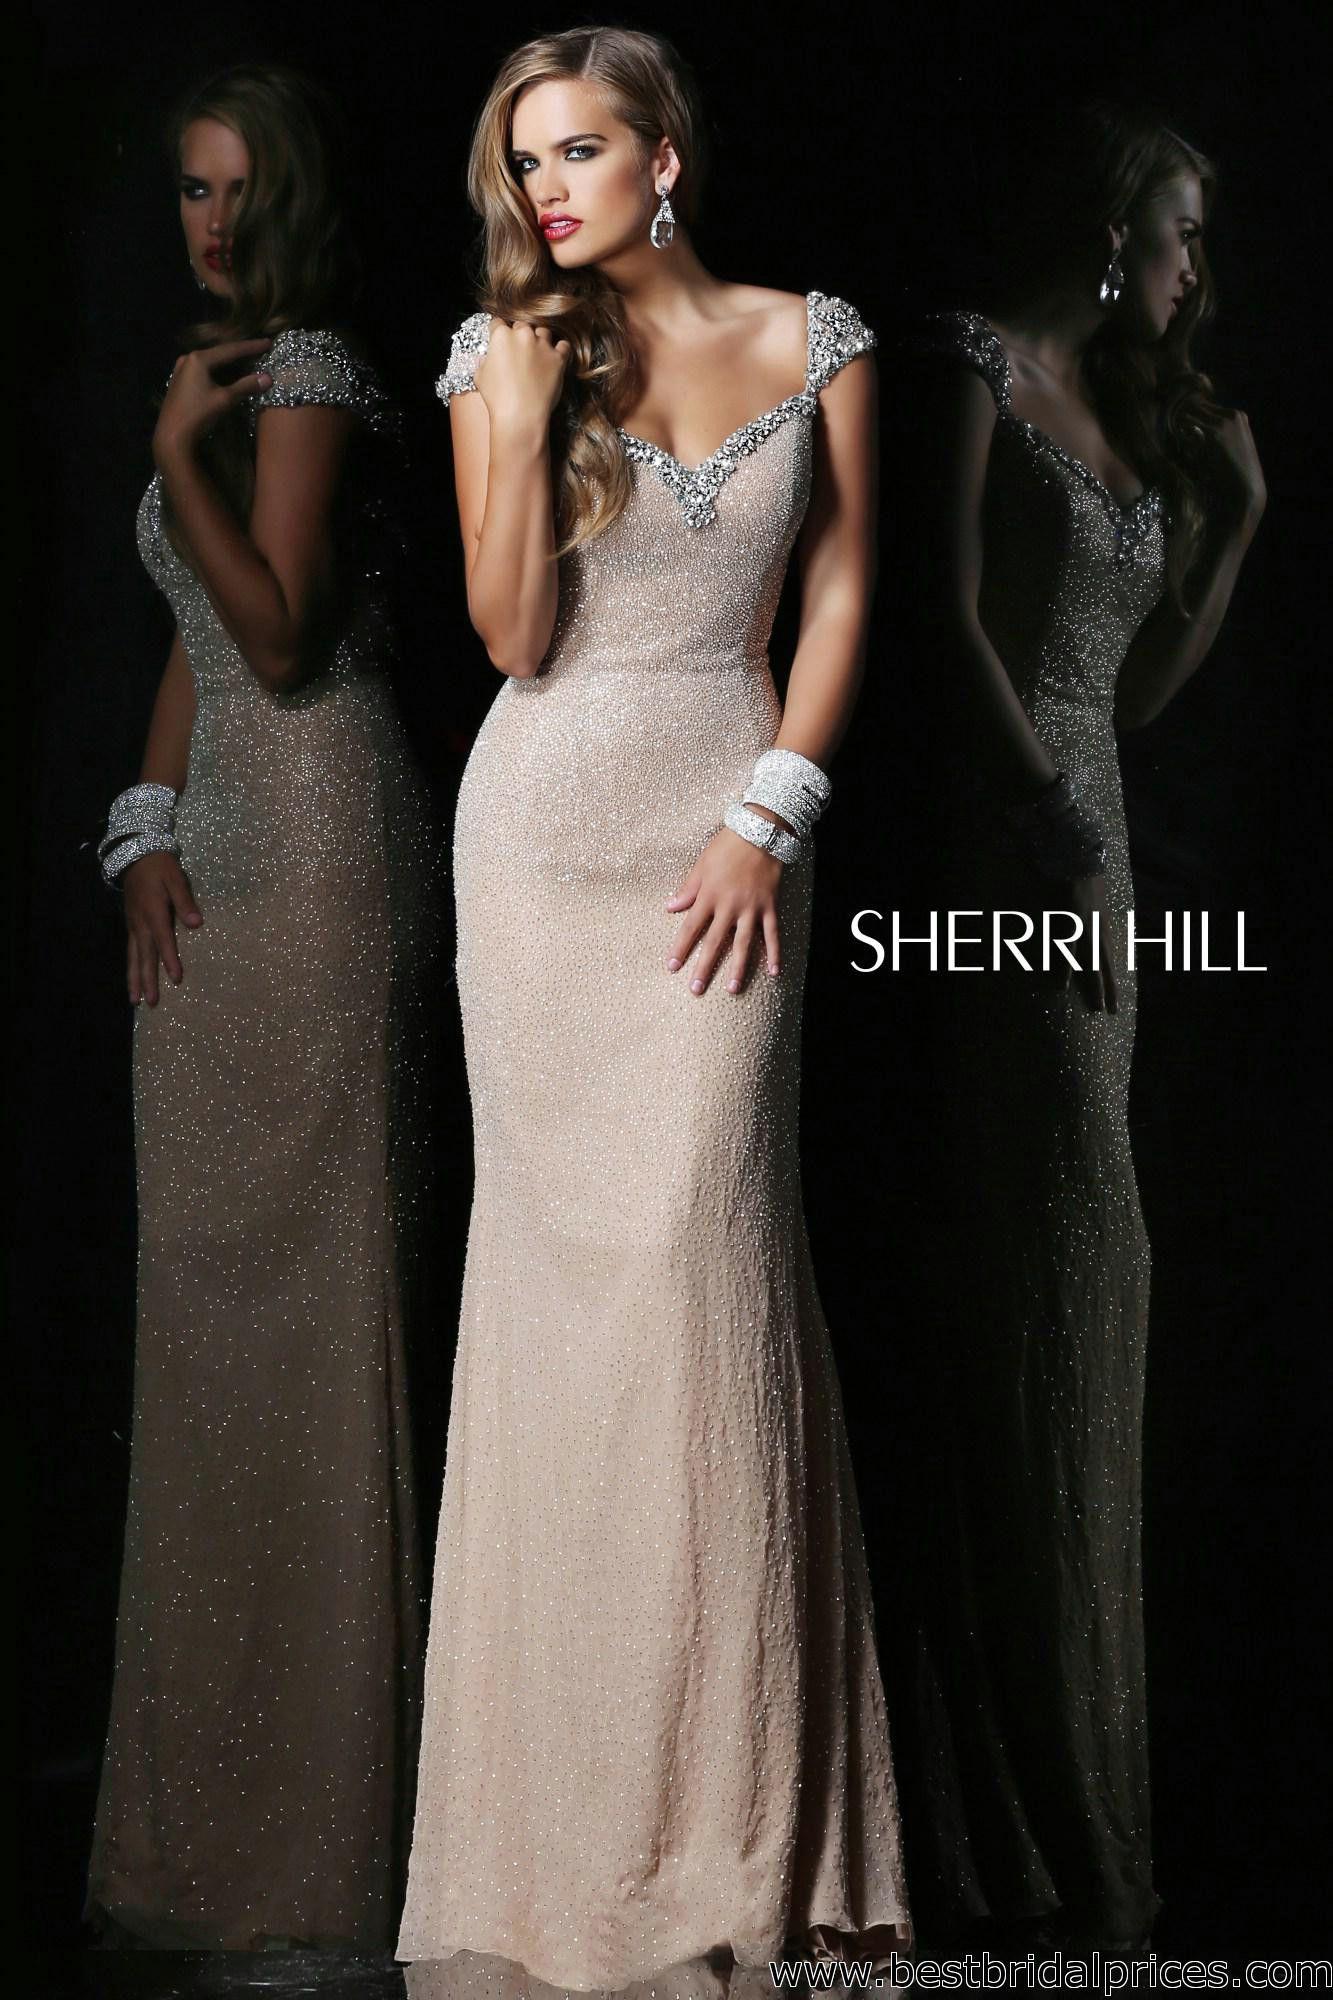 Sherri hill style prom ideas pinterest wedding martin